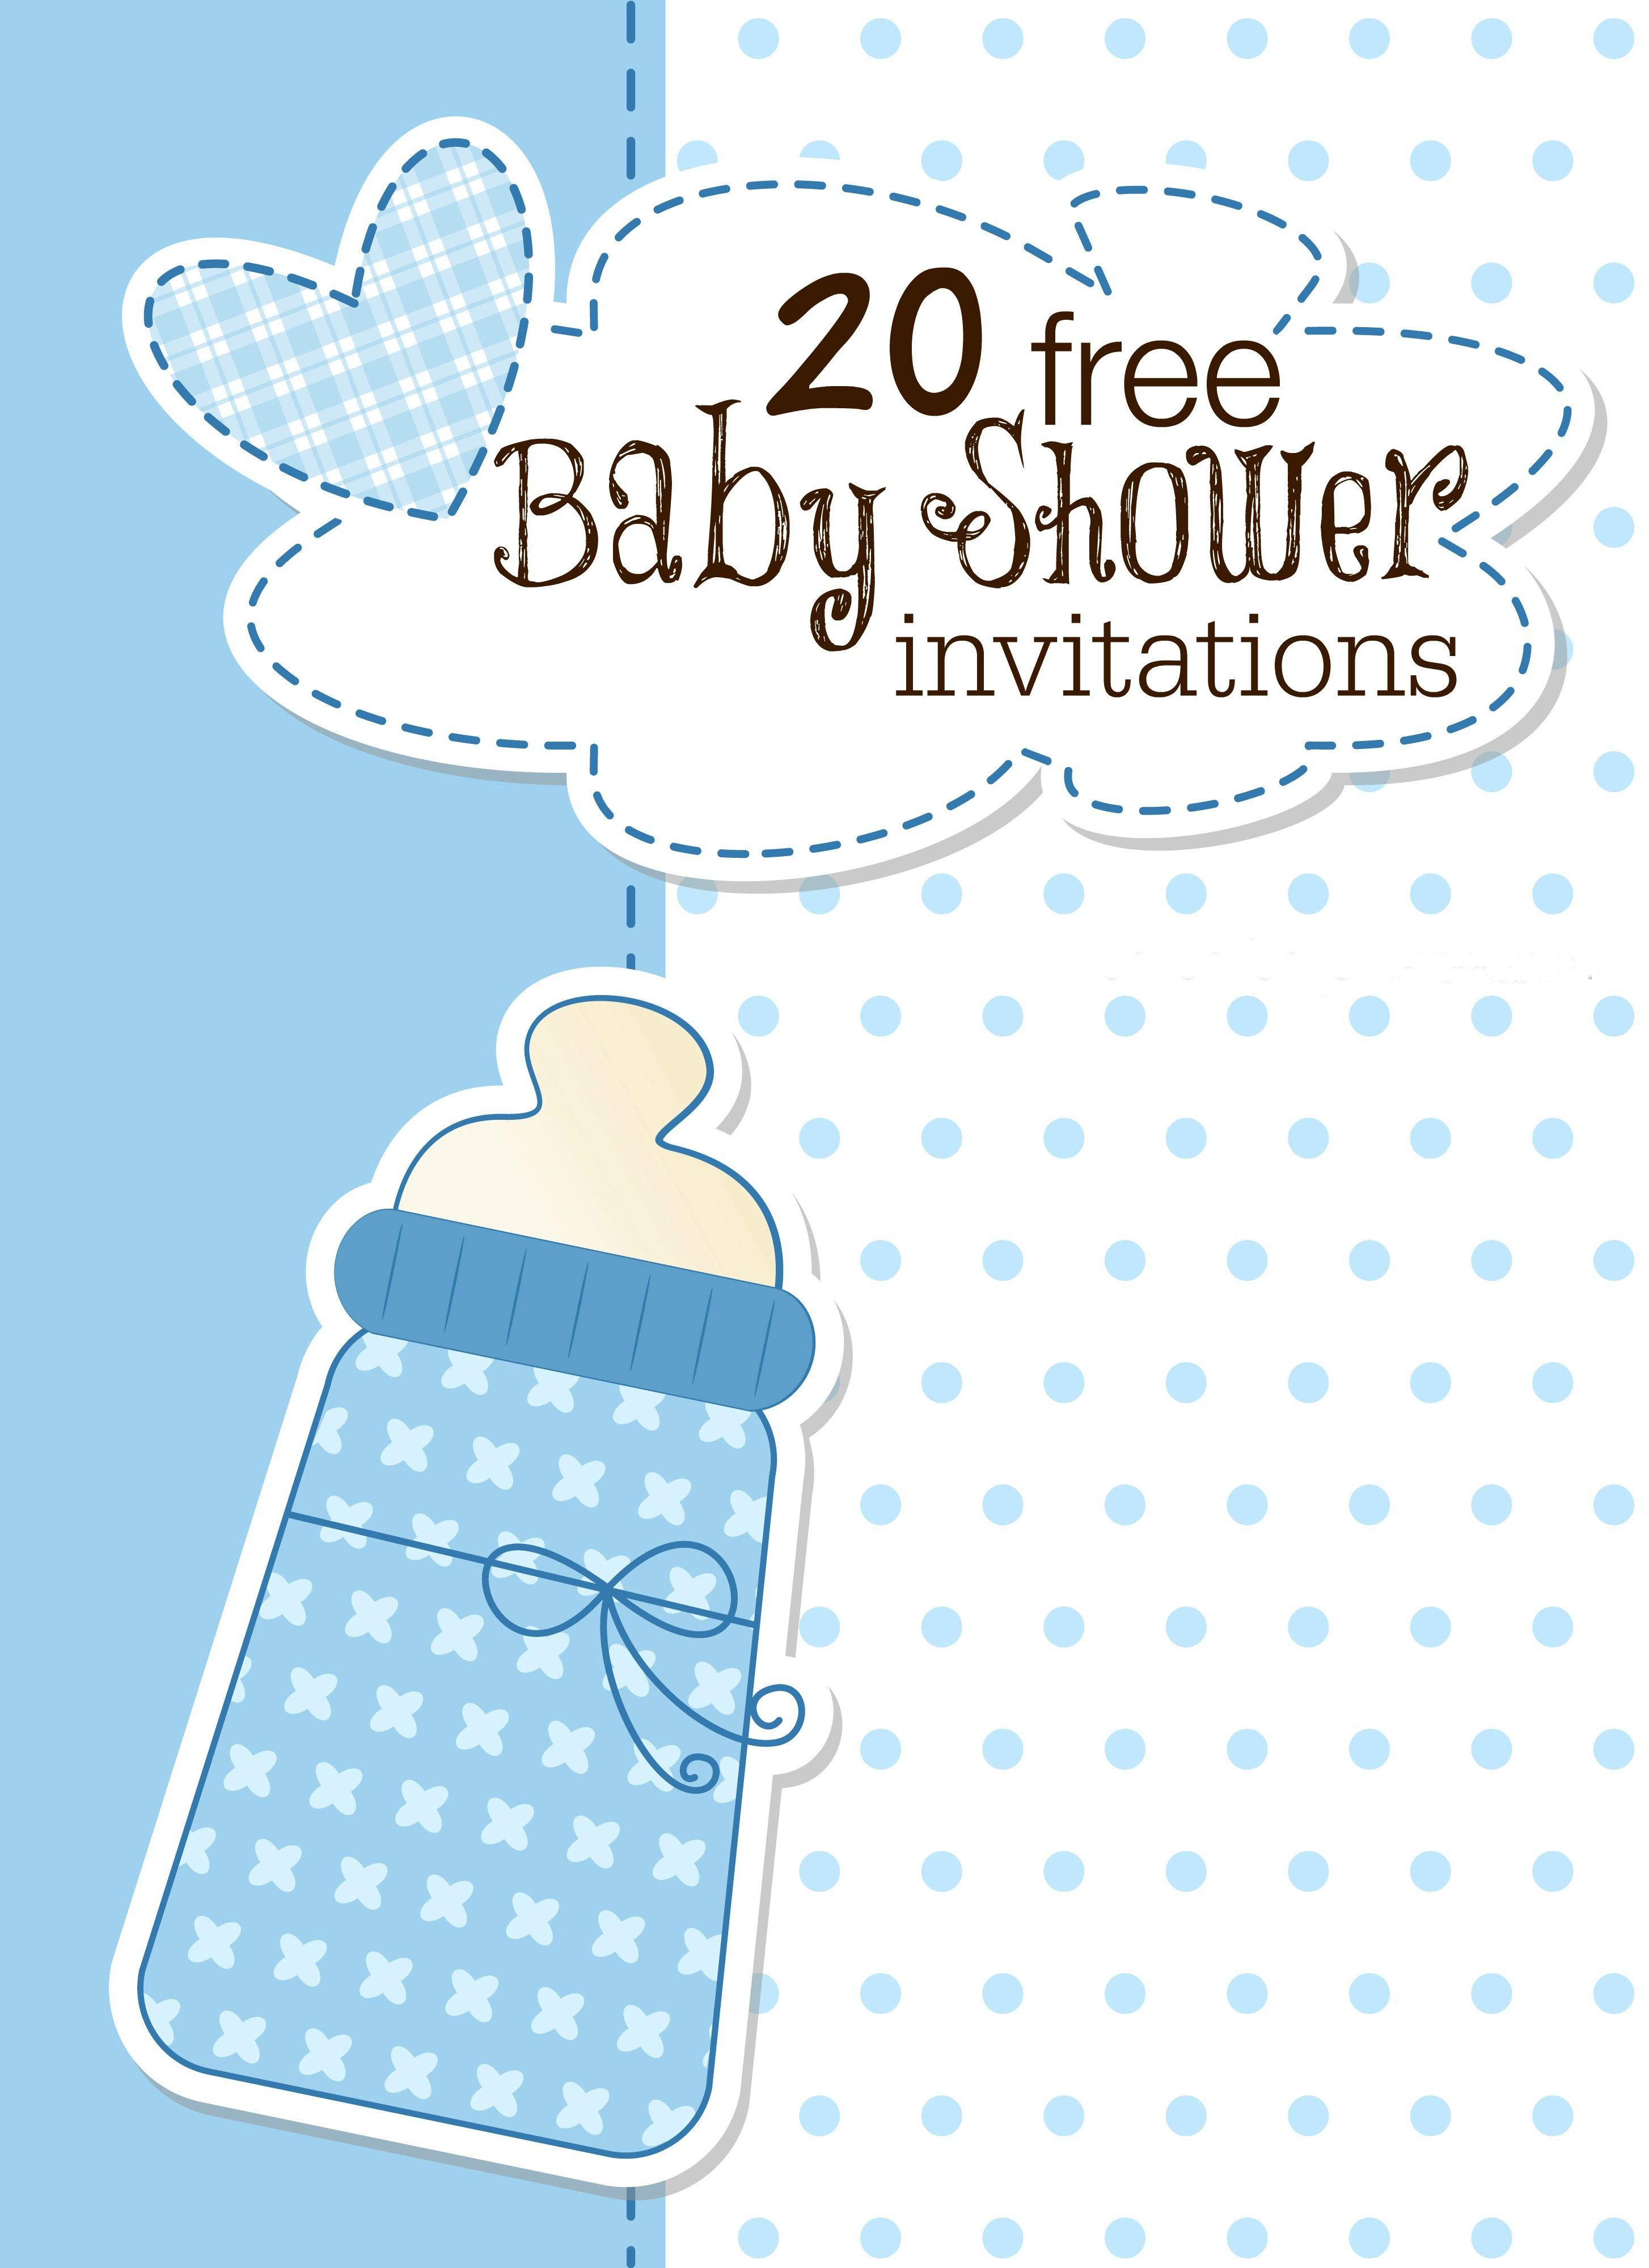 Printable Baby Shower Invitations - Free Printable Blank Baby Shower Invitations